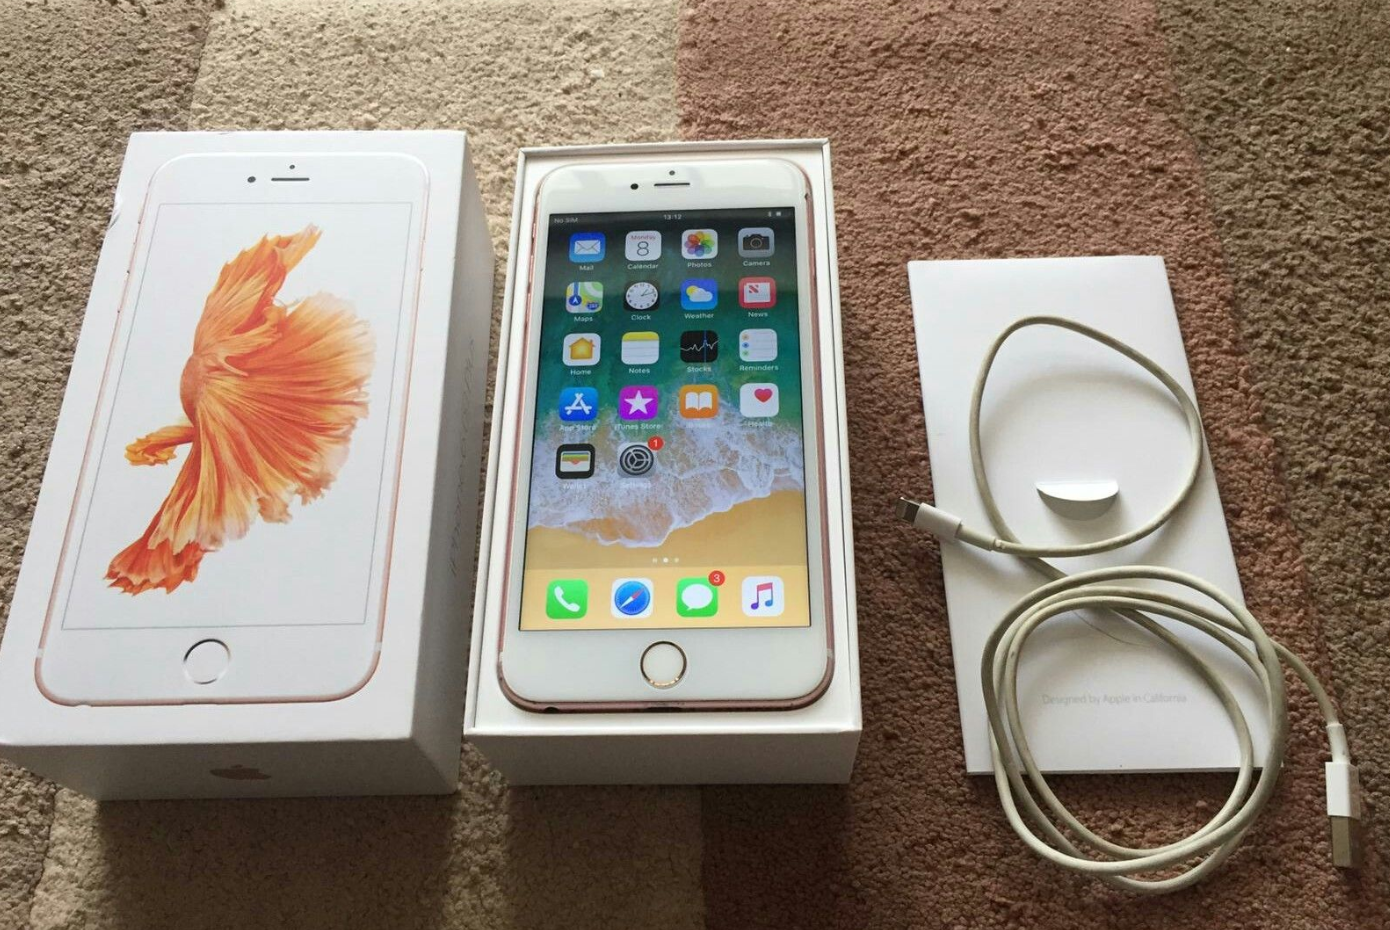 Telefon Mobil Apple Iphone 6s Plus 32gb Rose Gold Ausreise Info White Mobile Phone